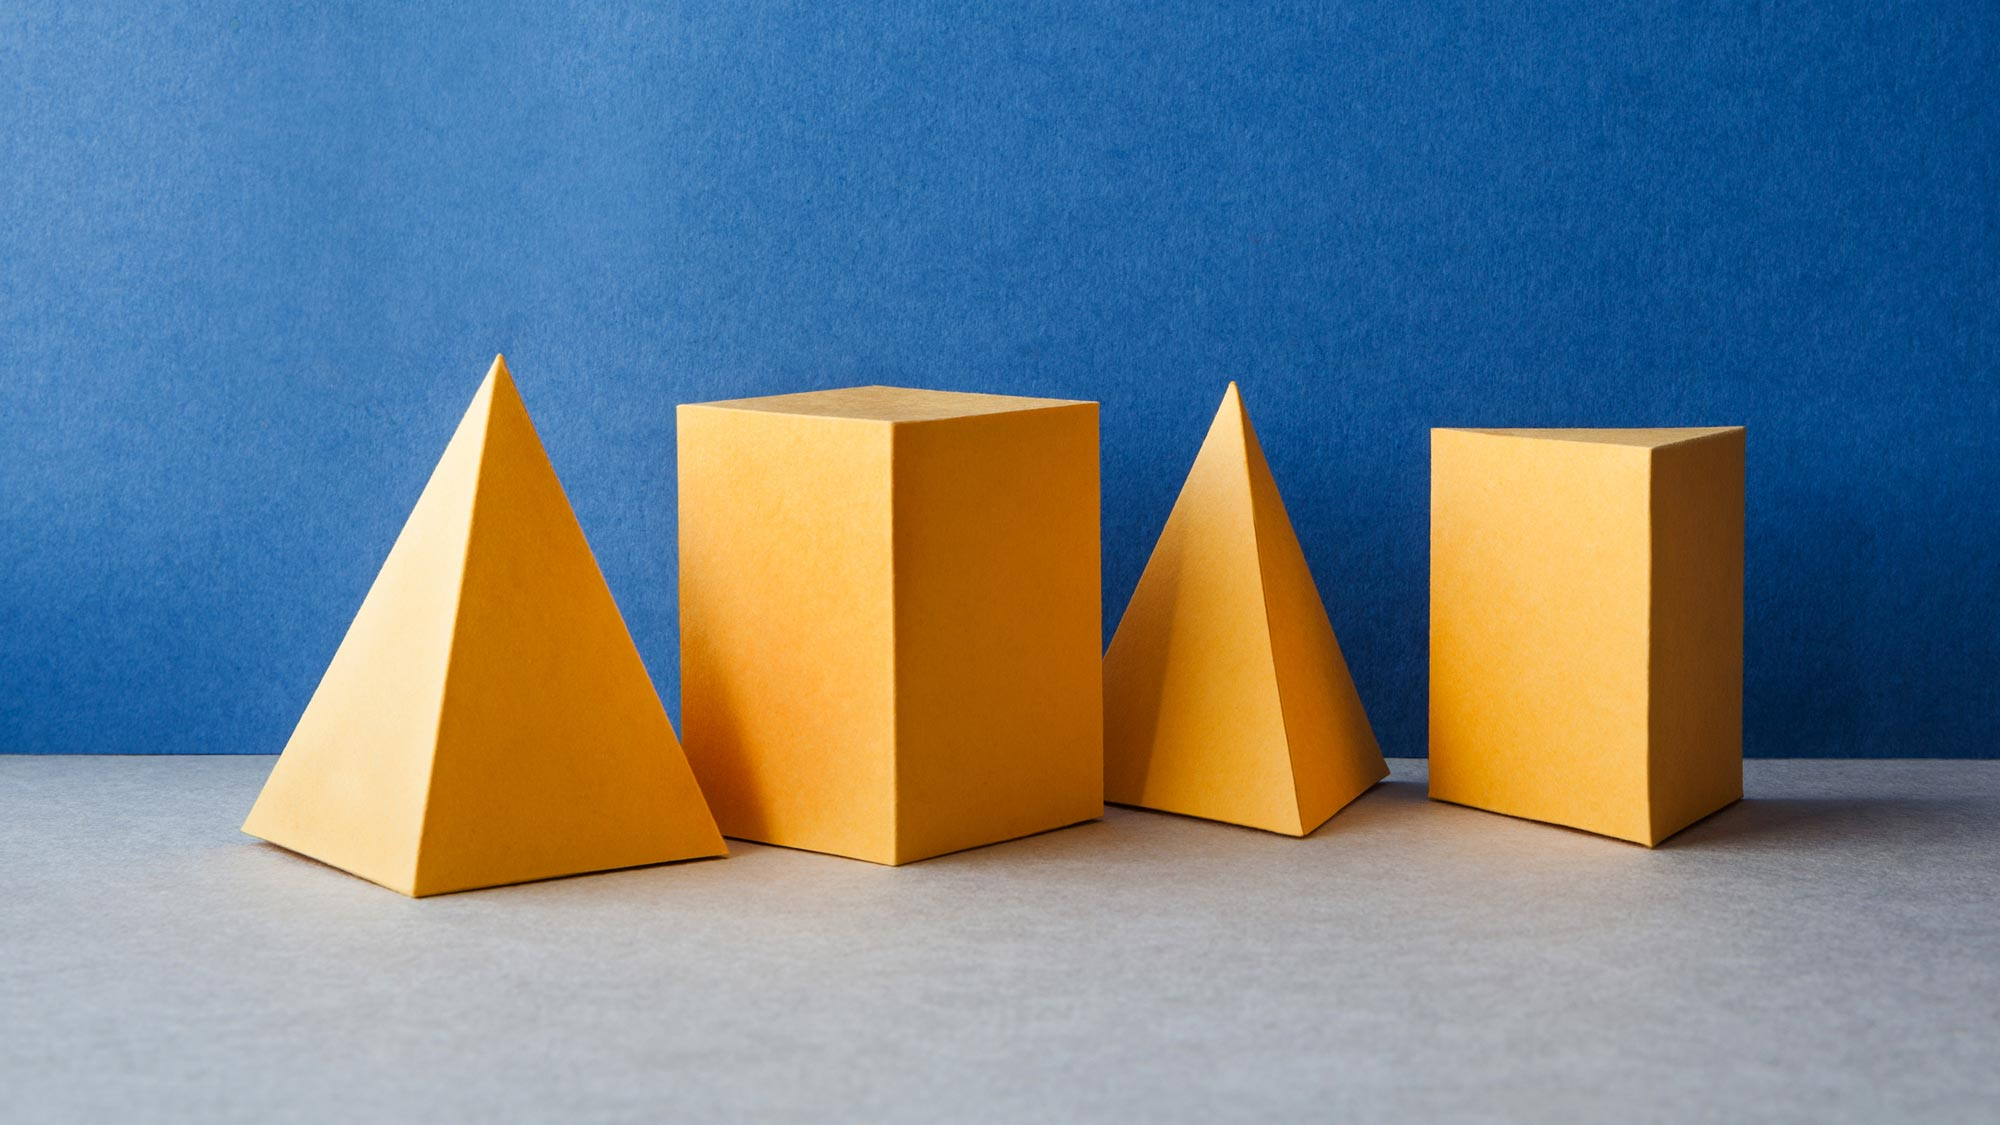 abstract-geometric-figures-three-dimensional-pyram-NU7ZXFA.jpg